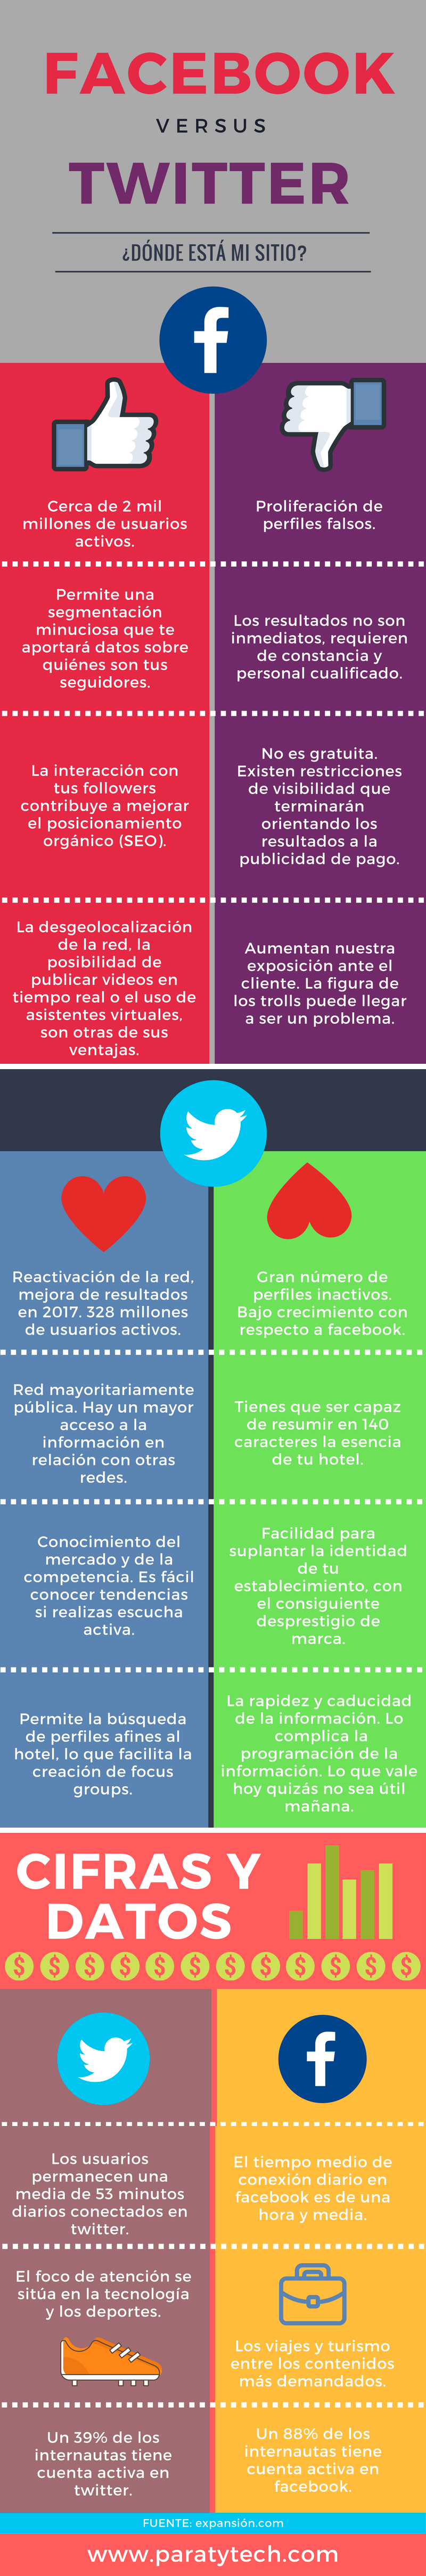 infografia-julio (1)